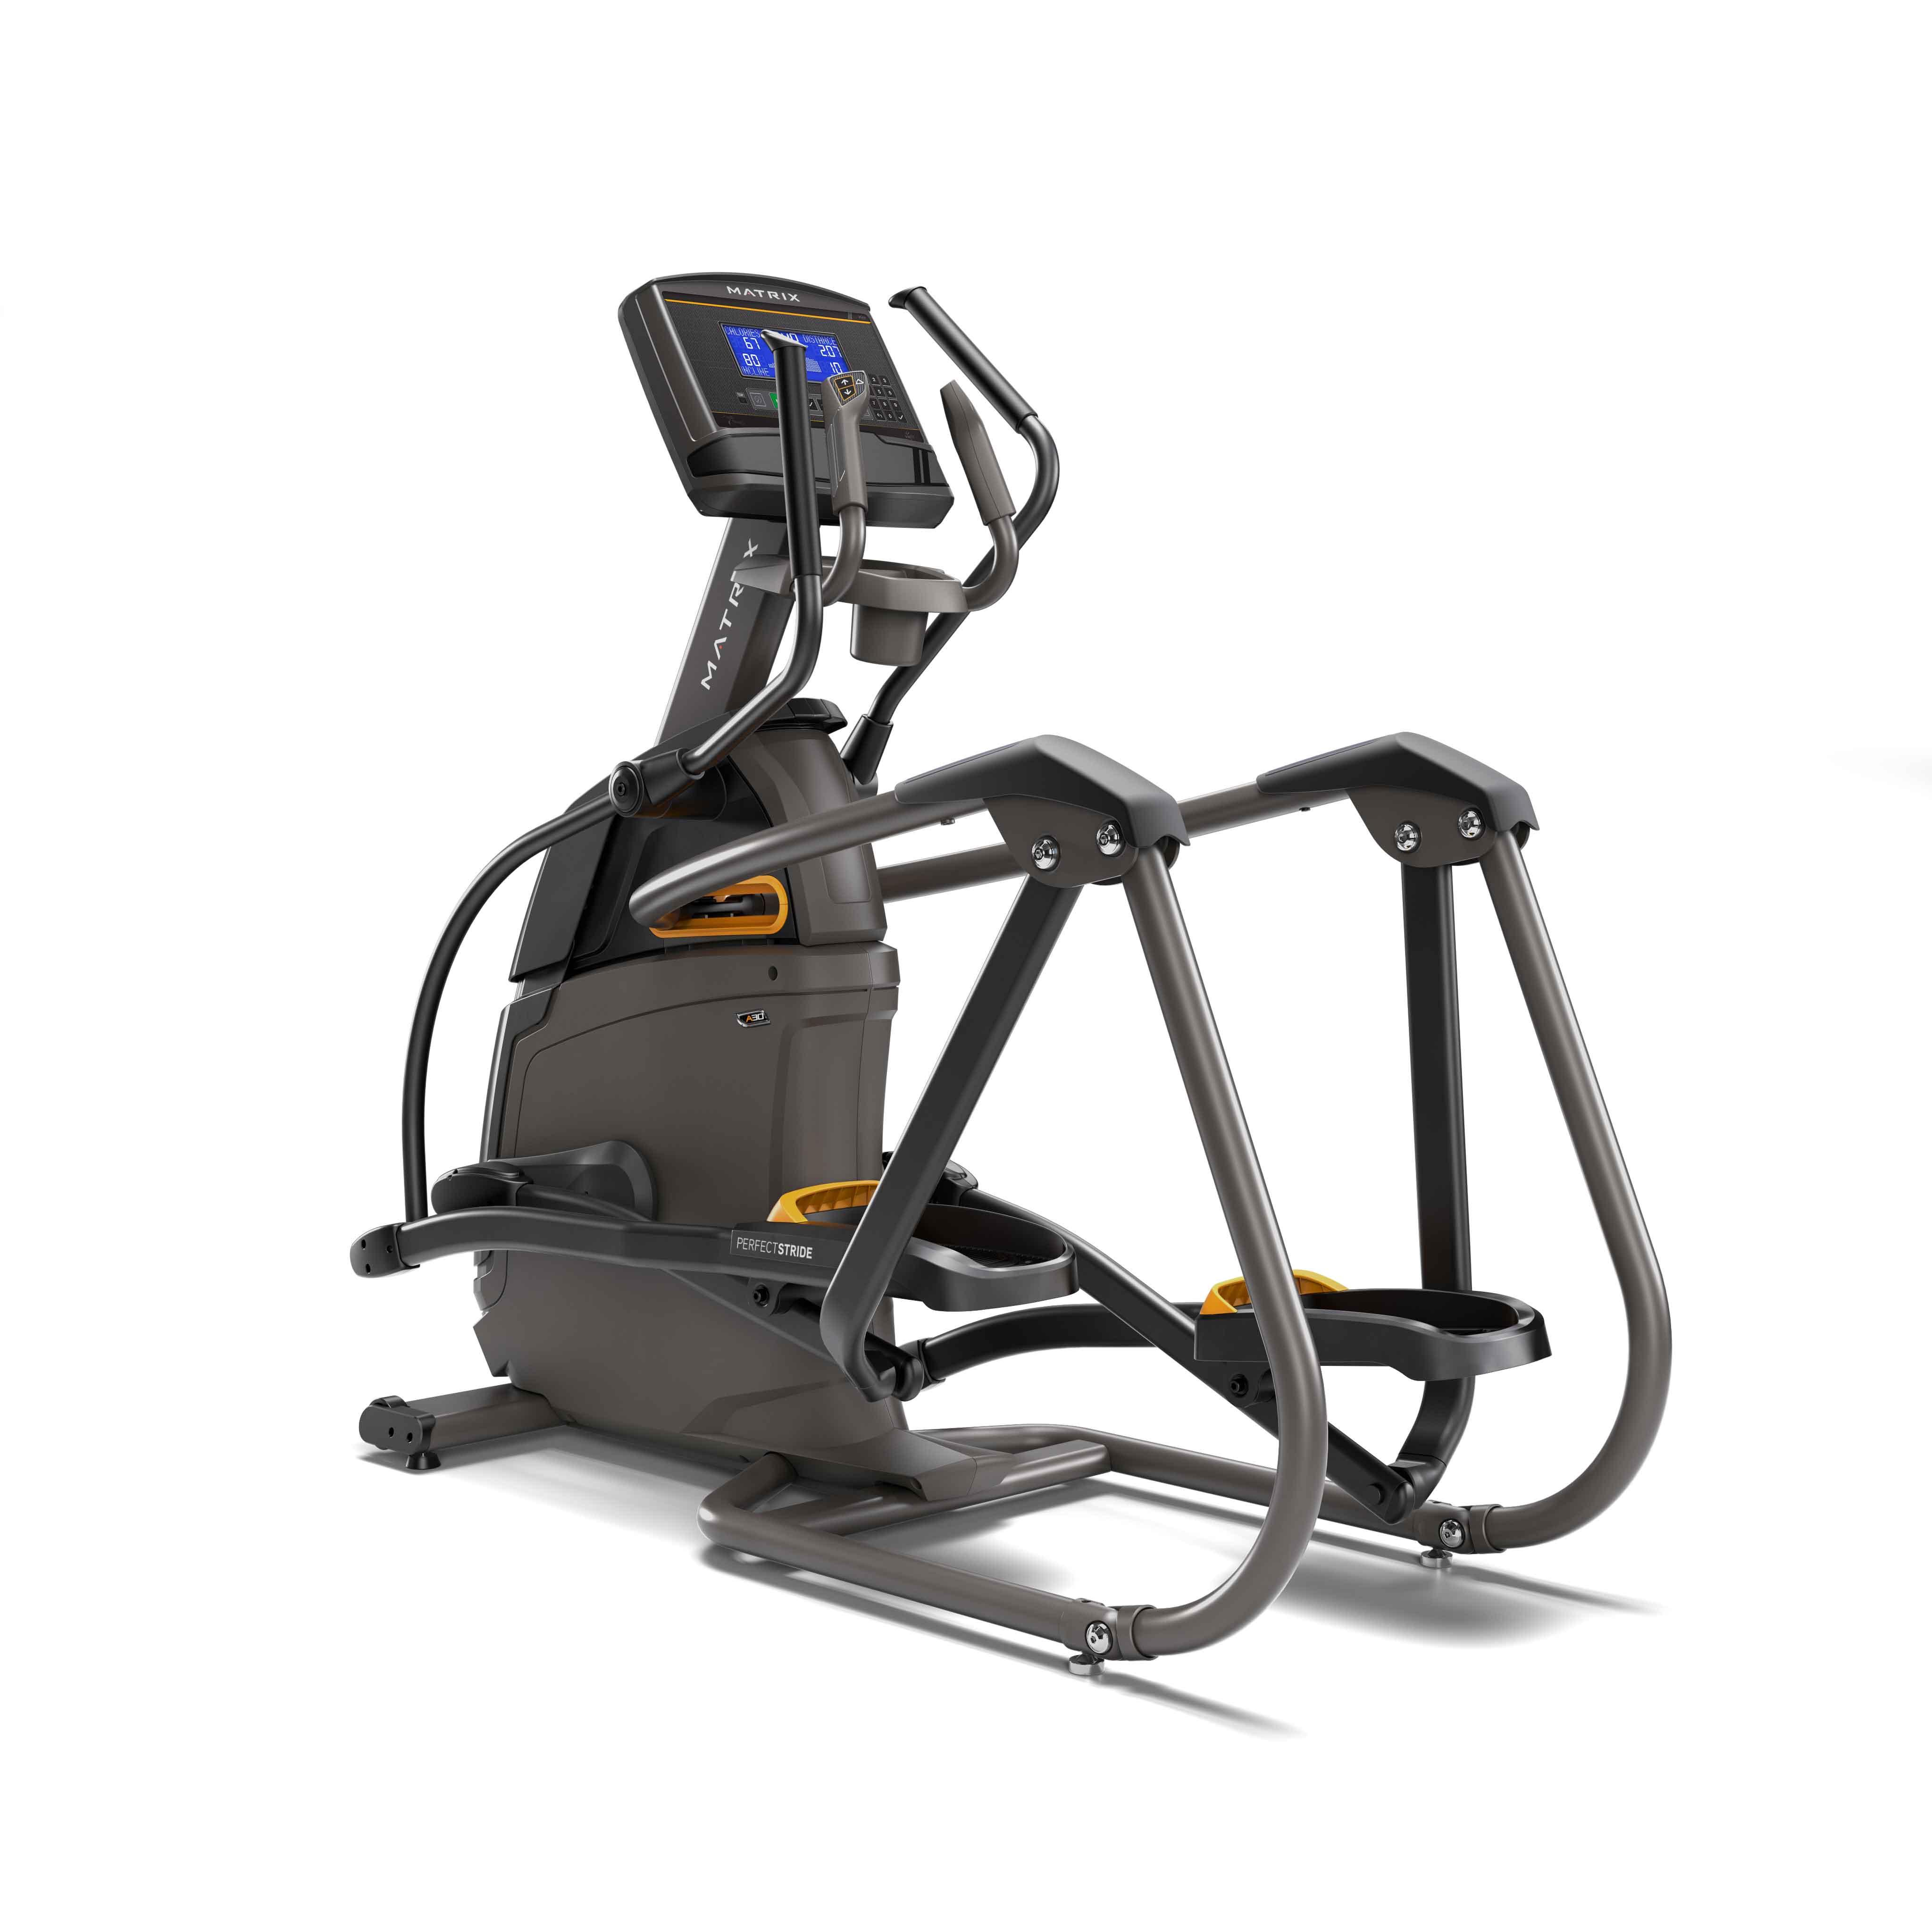 Fitness Equipment Industry Statistics: Matrix A30 XR Ascent Trainer Elliptical